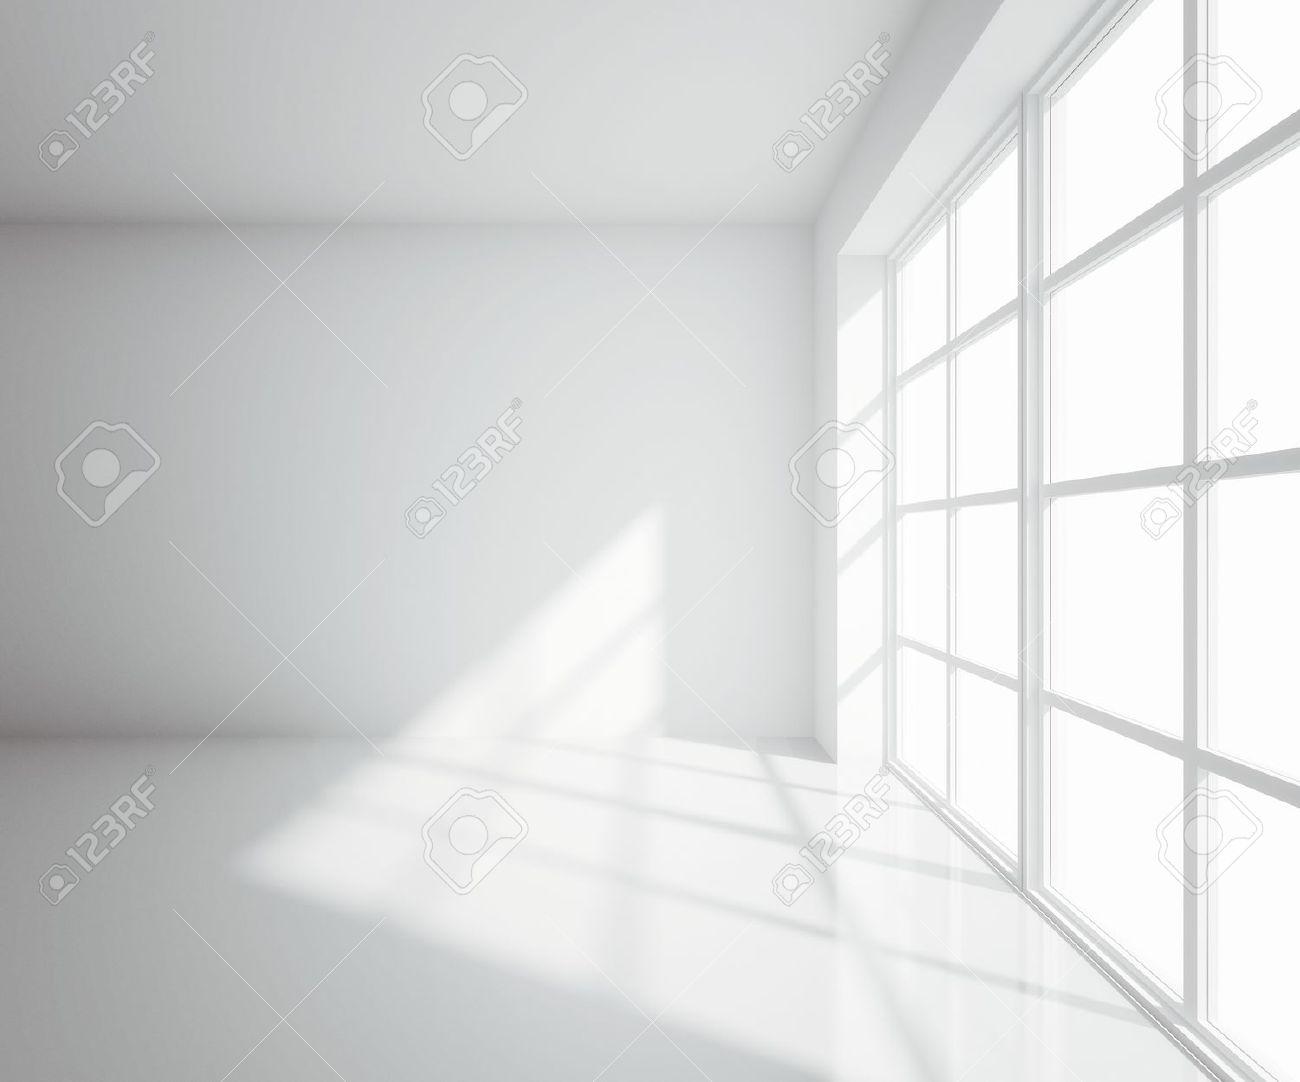 light white room with window - 15061679